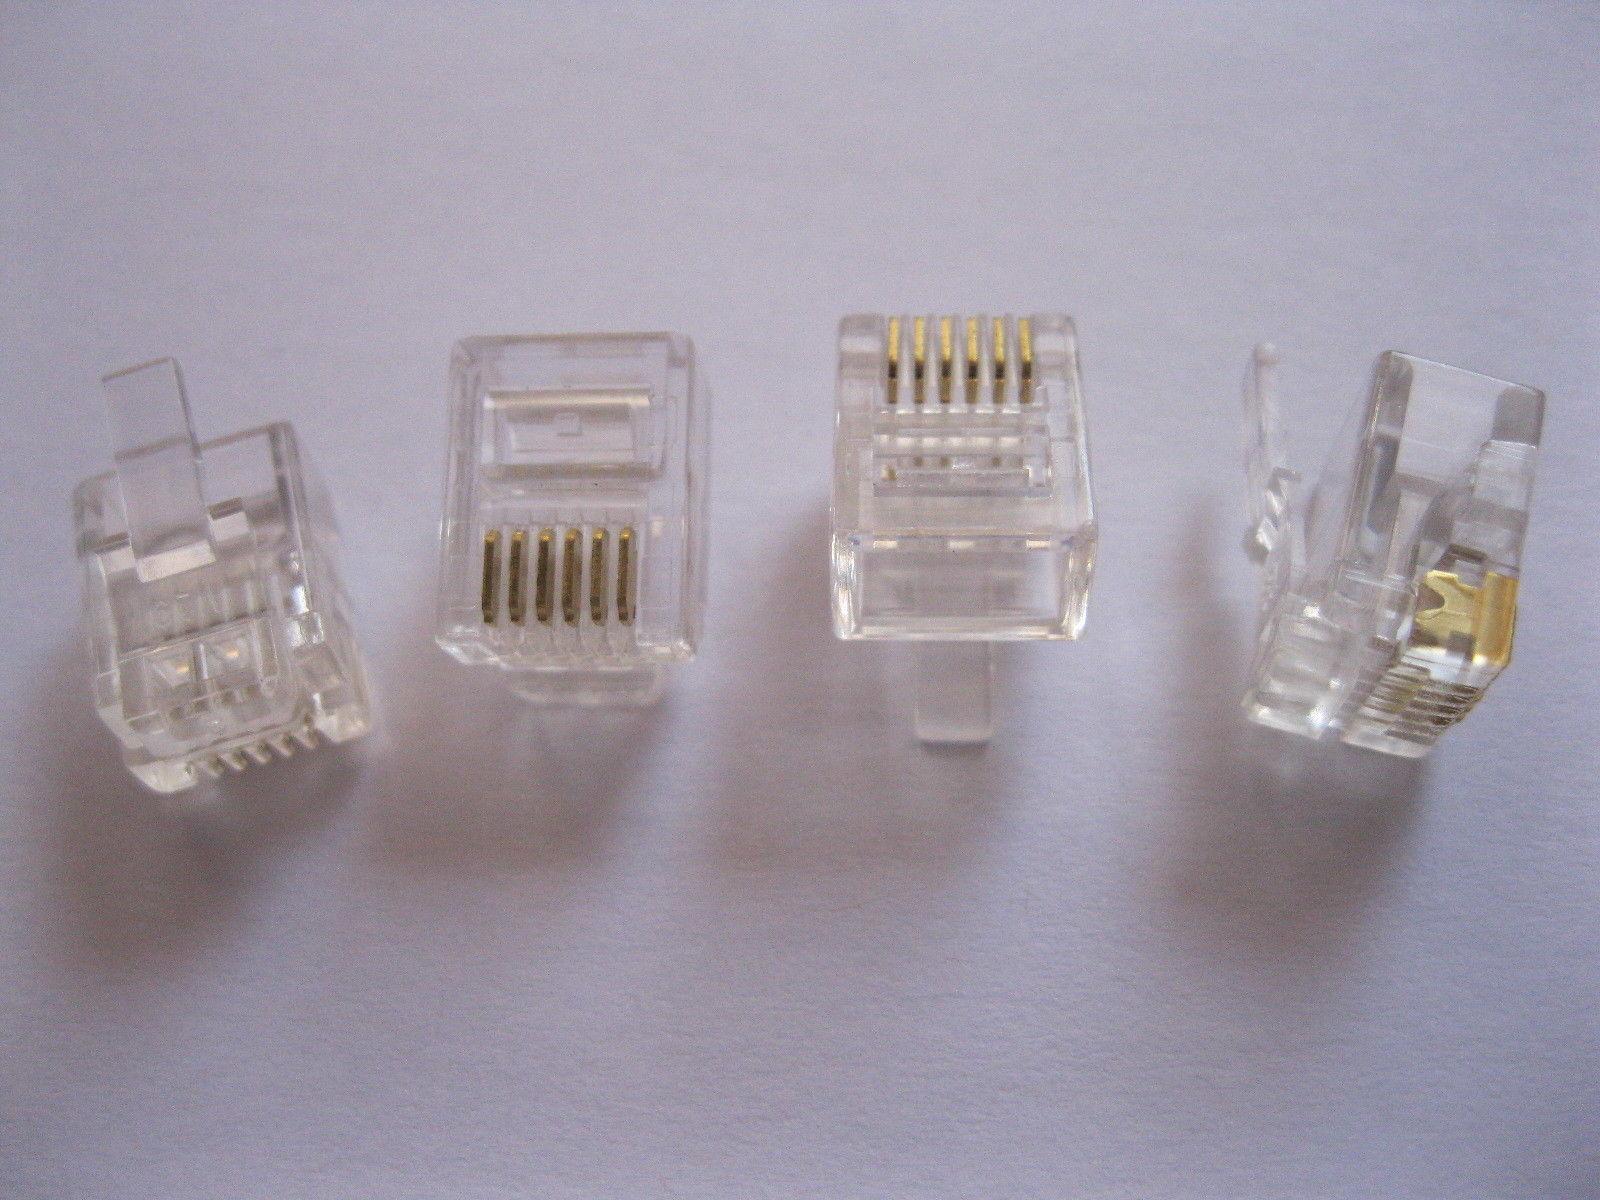 100 piezas RJ11 6P6C Modular Plug conector telefónico